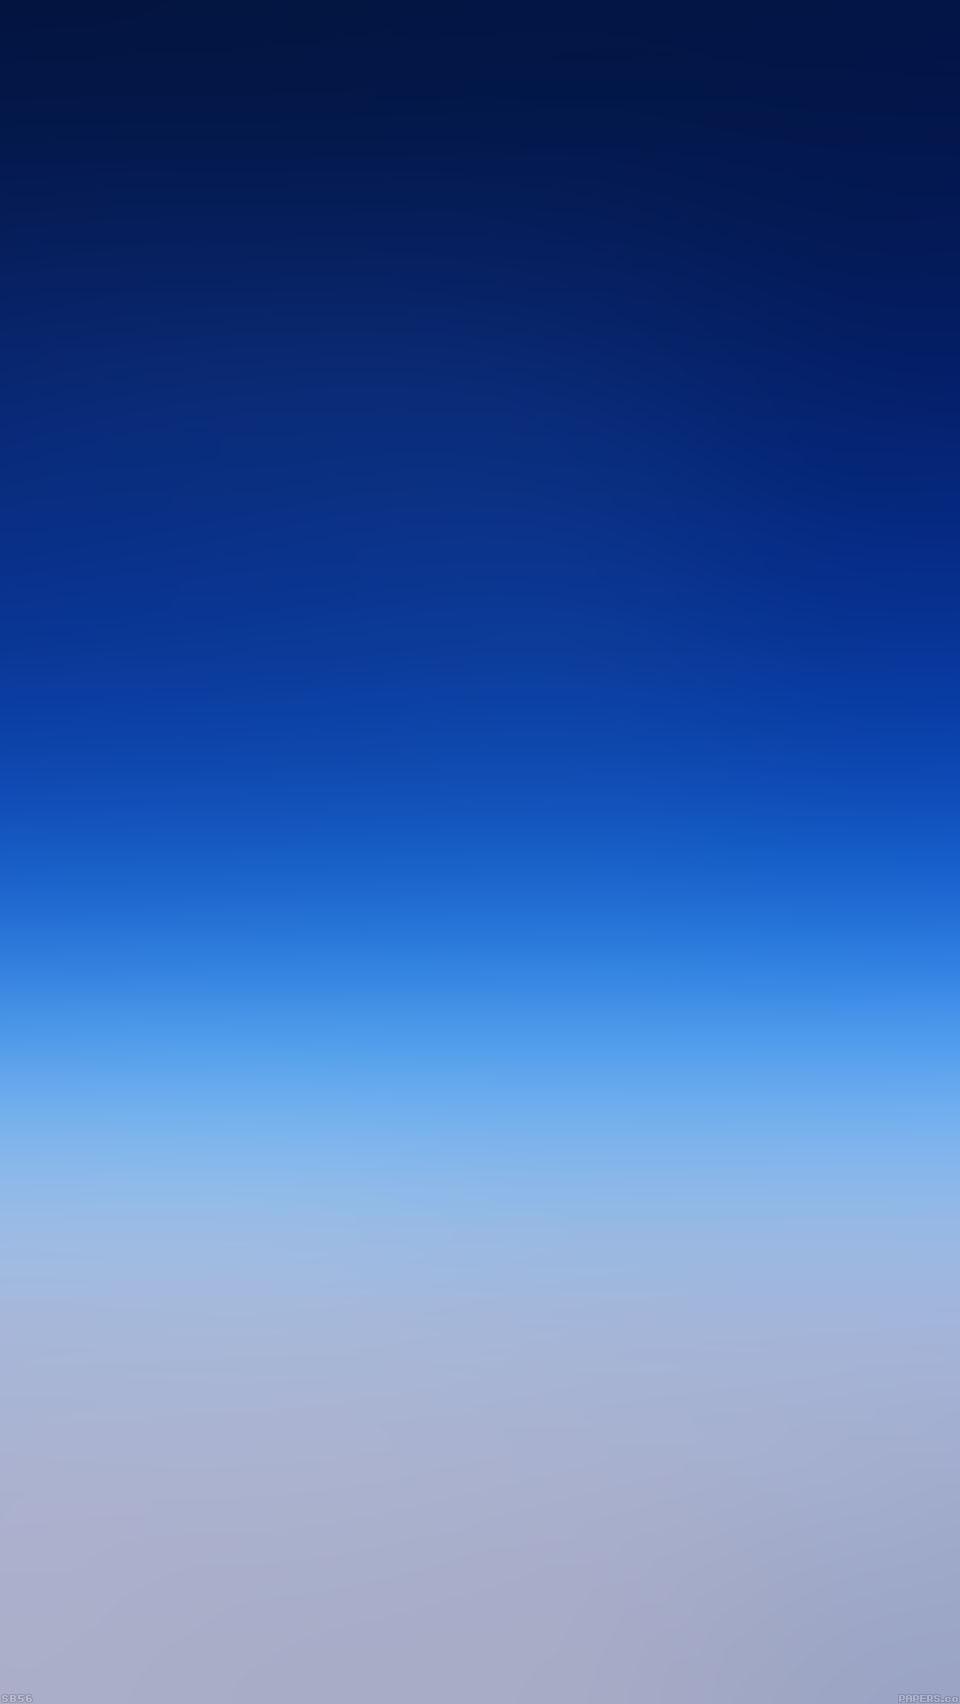 Wallpaper of the WeekiPhone 6 wallpaper packs 960x1704